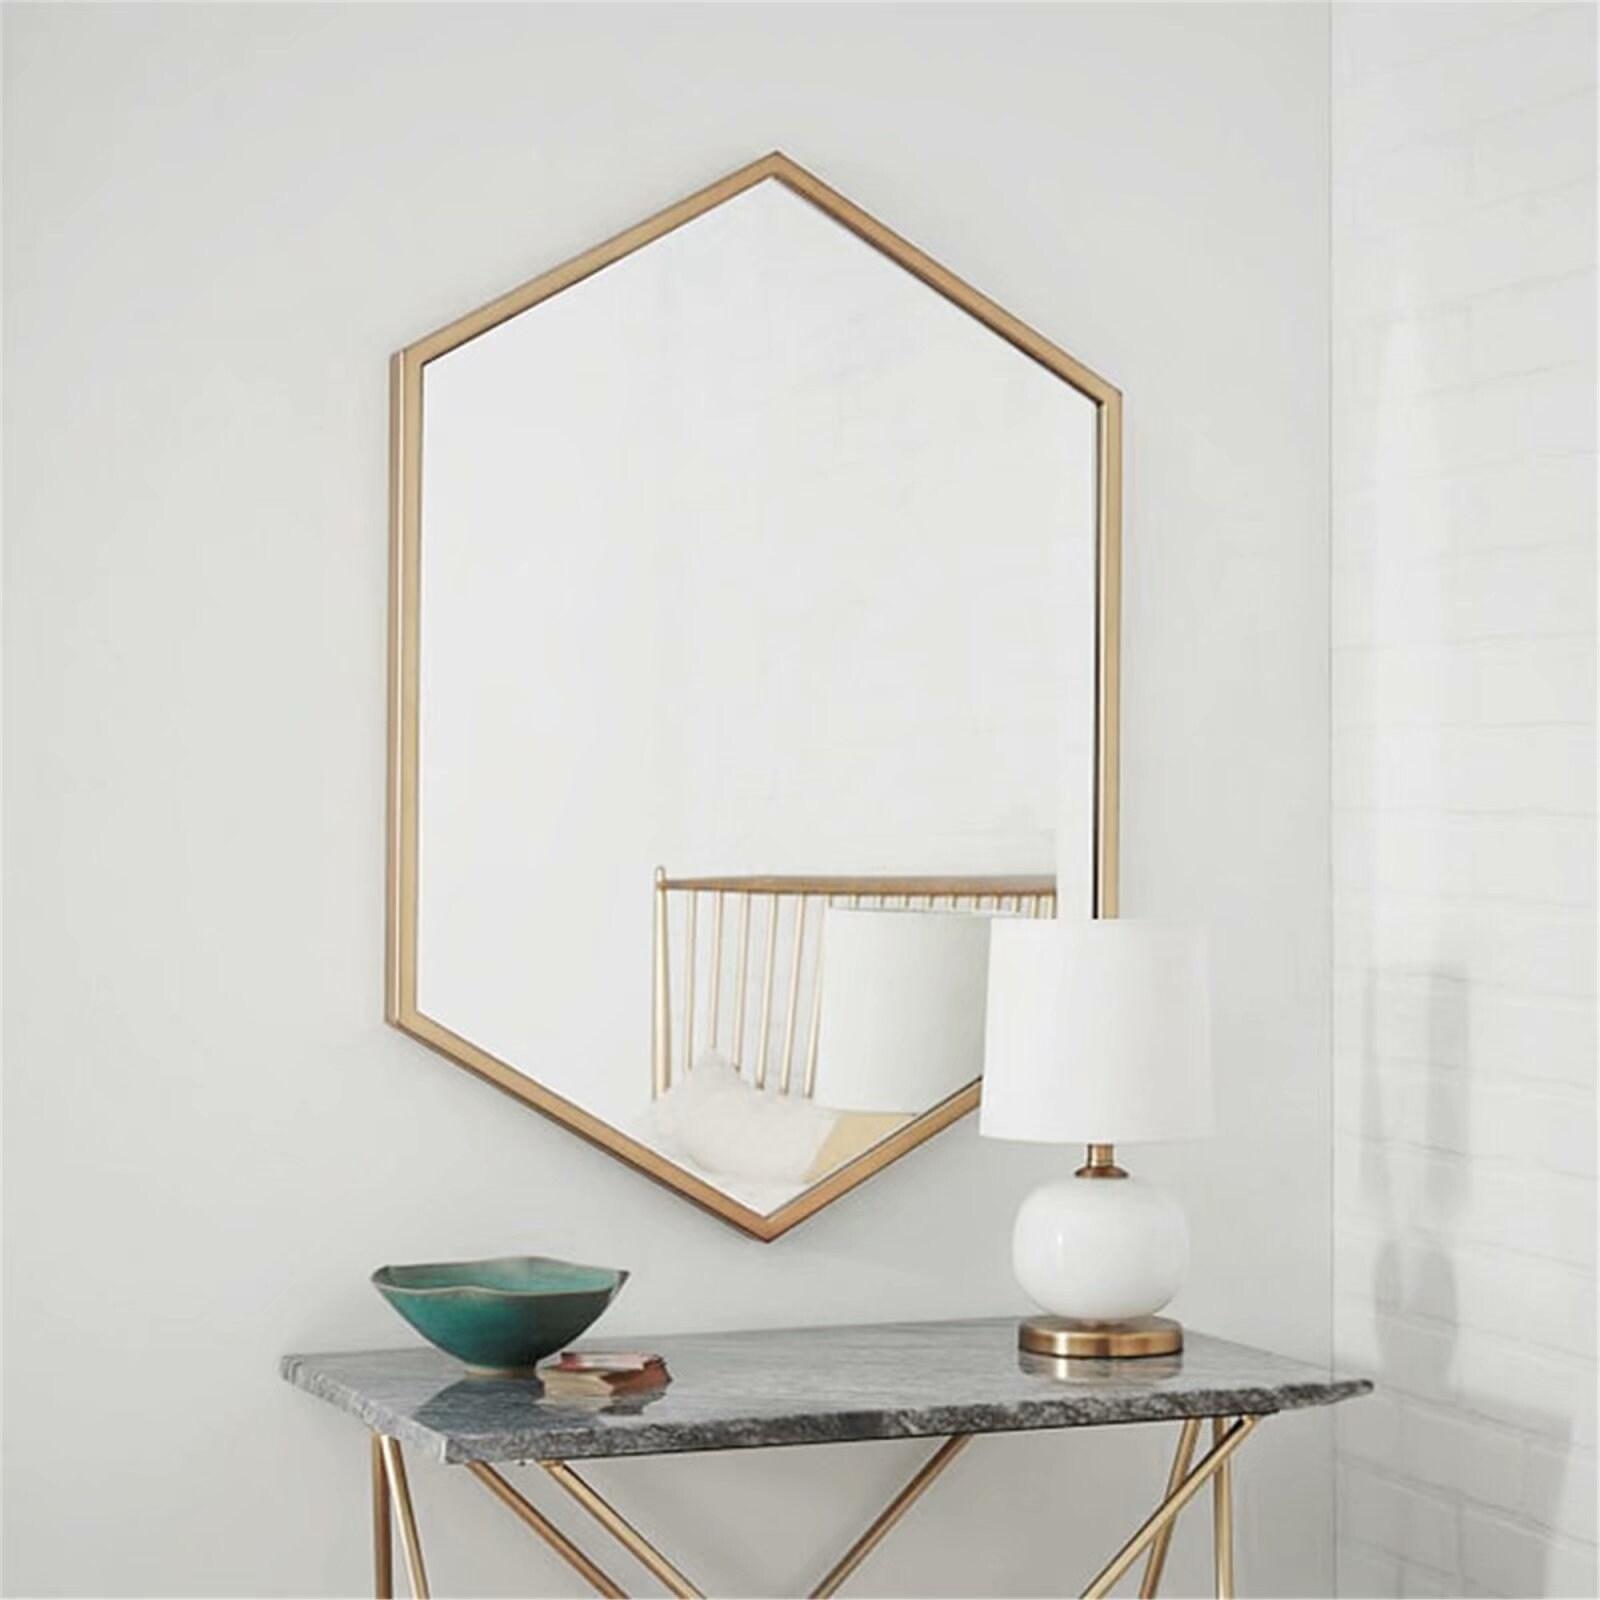 Long Hexagon Modern Decorative Wall Mounted Mirror 50 70cm